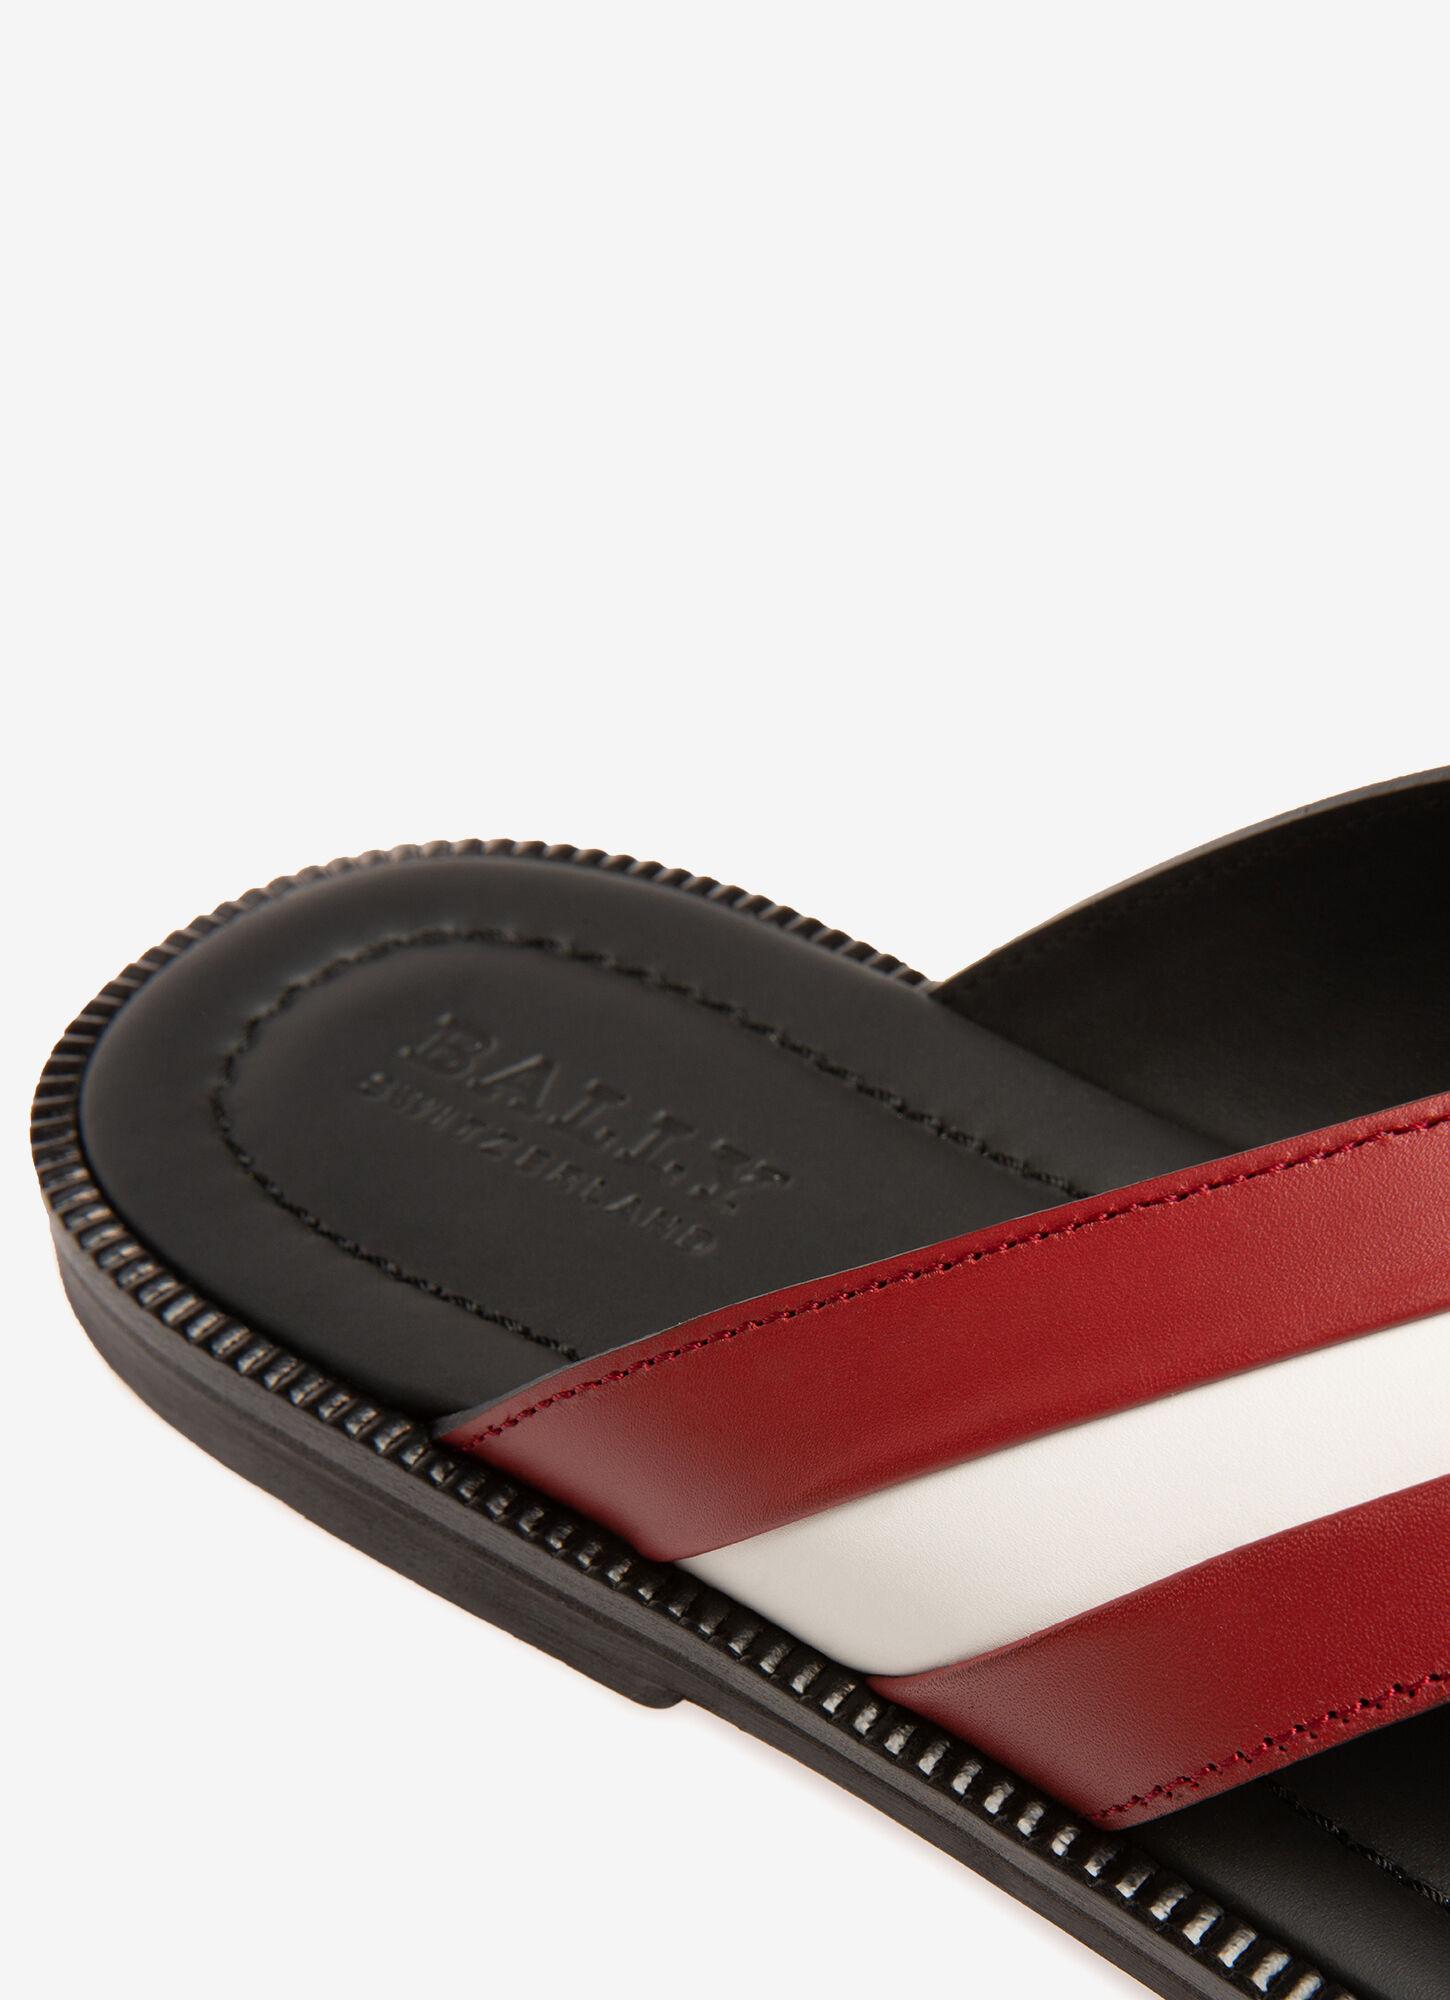 JAABIR| Mens Sandals | Black Leather